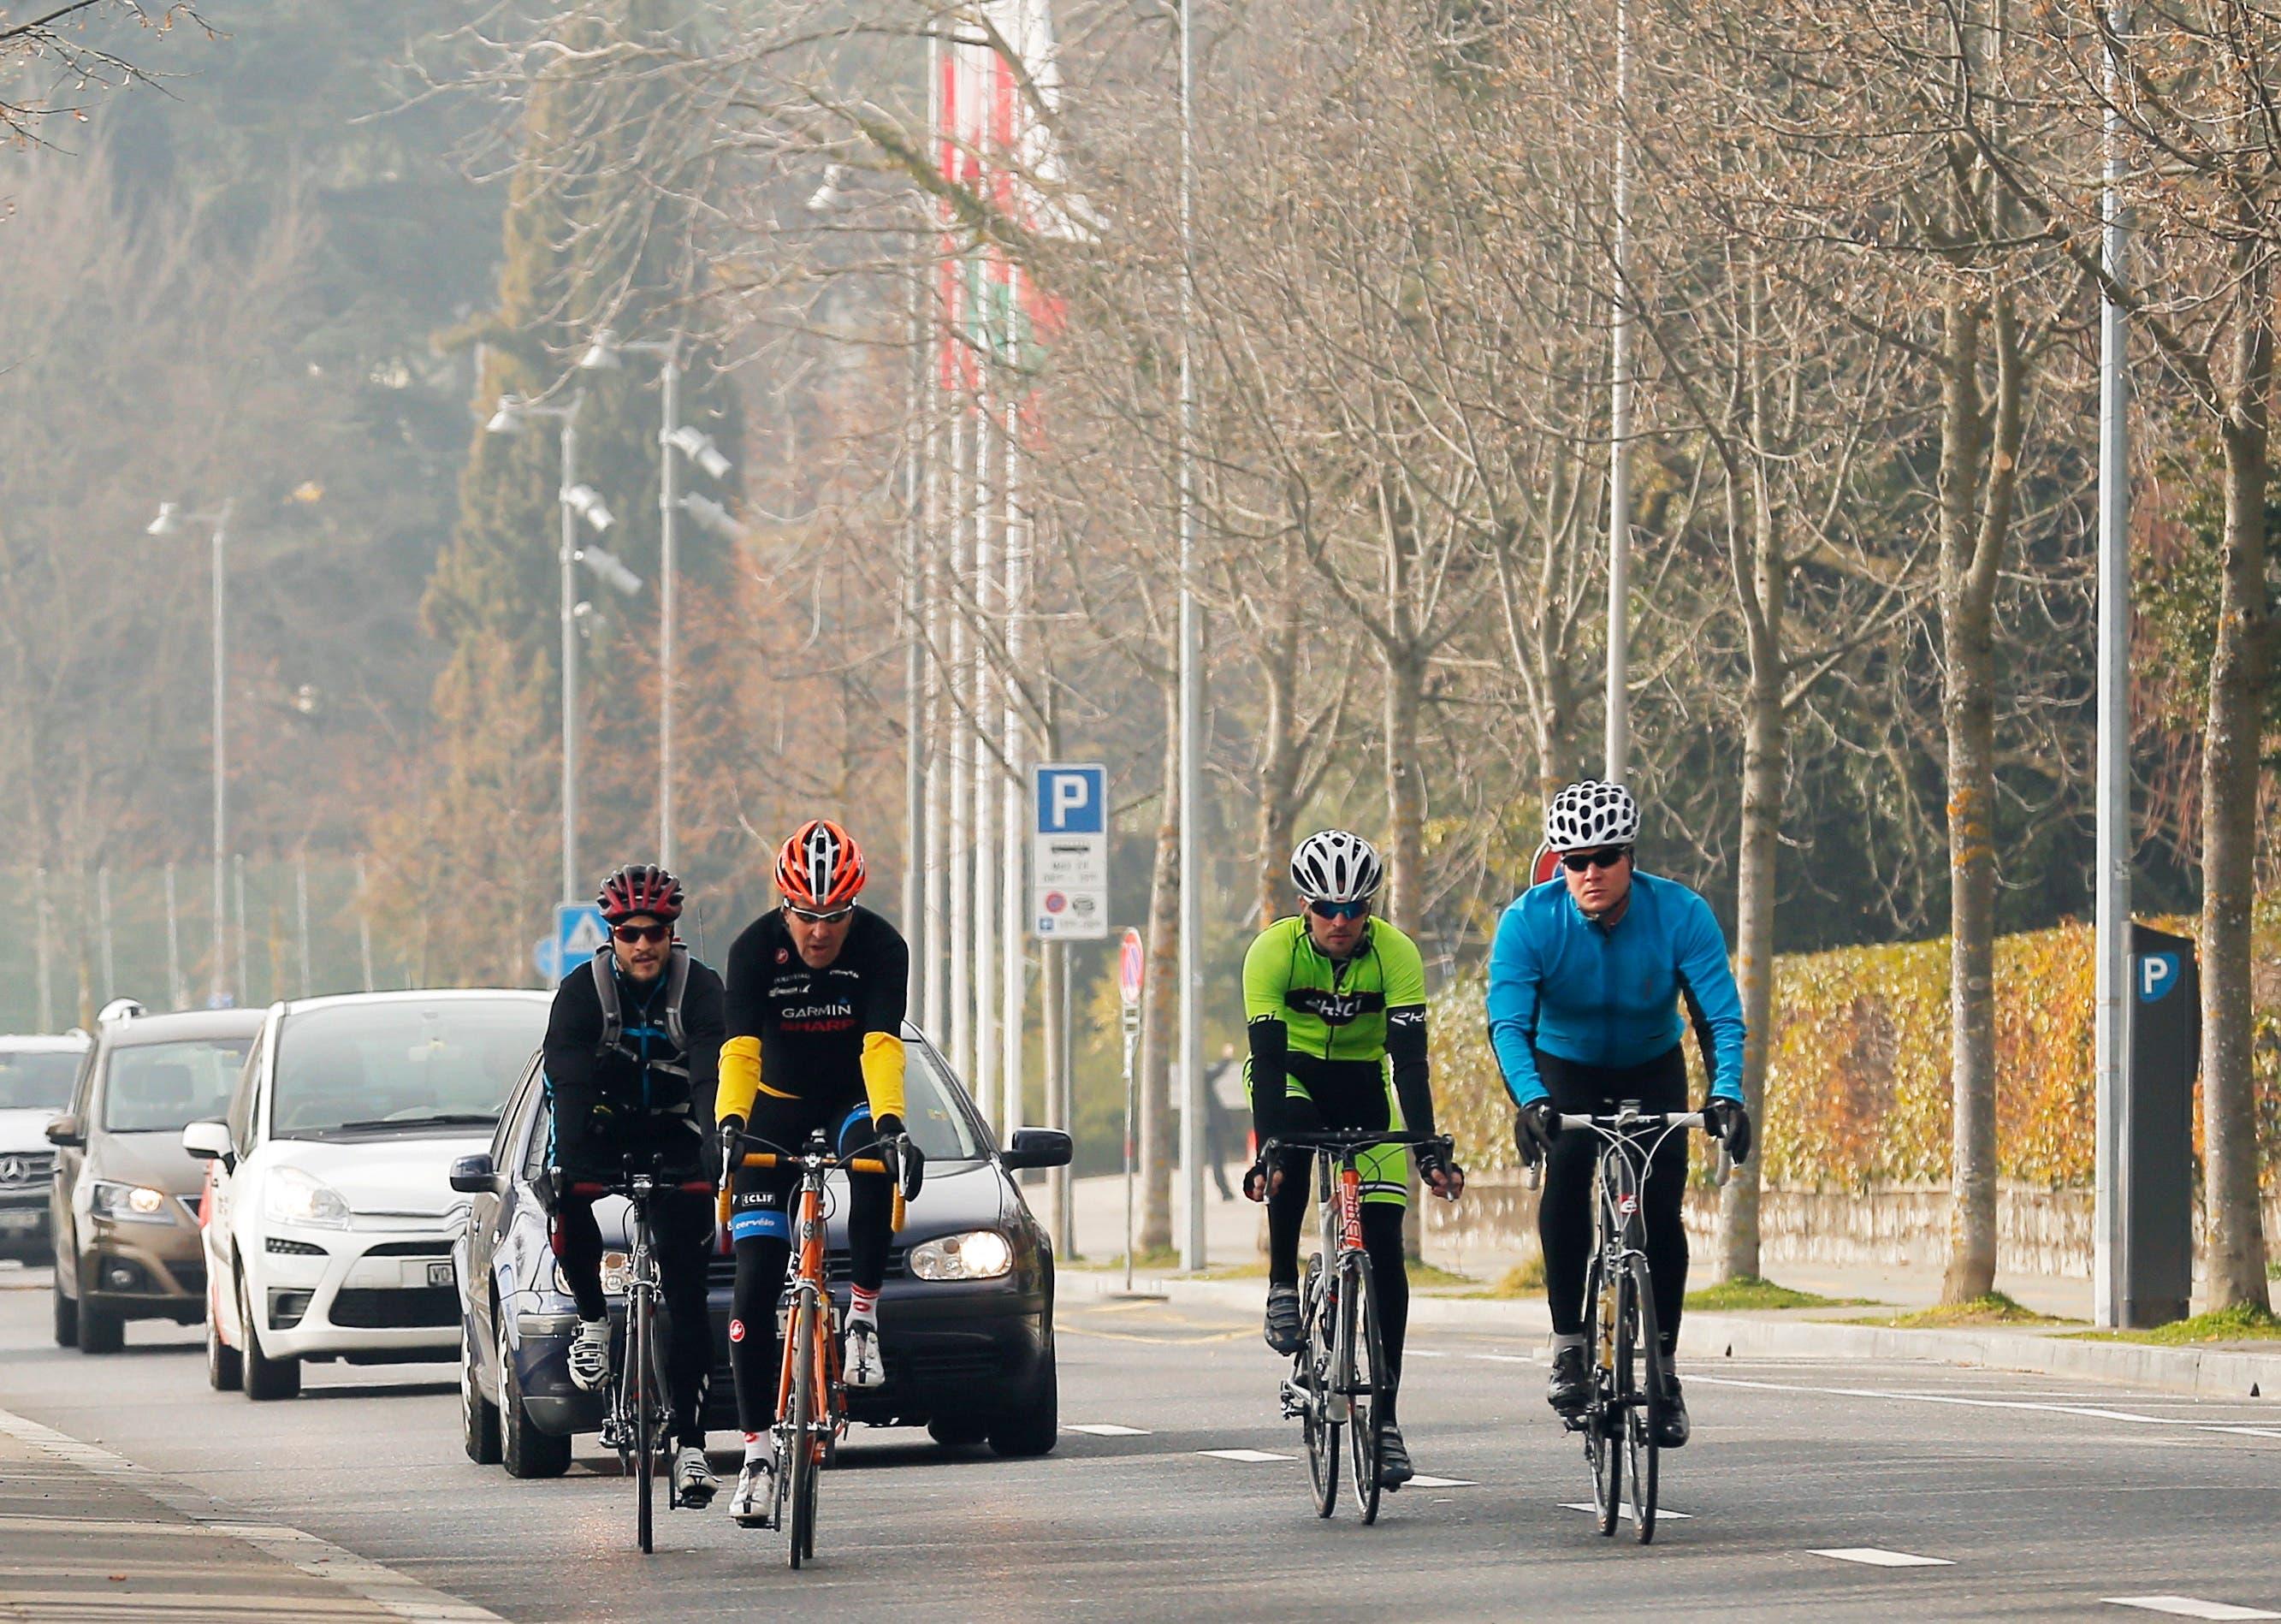 Luft schnappen: US-Aussenminister John Kerry erkundet Lausannes Umgebung auf dem Rennvelo.